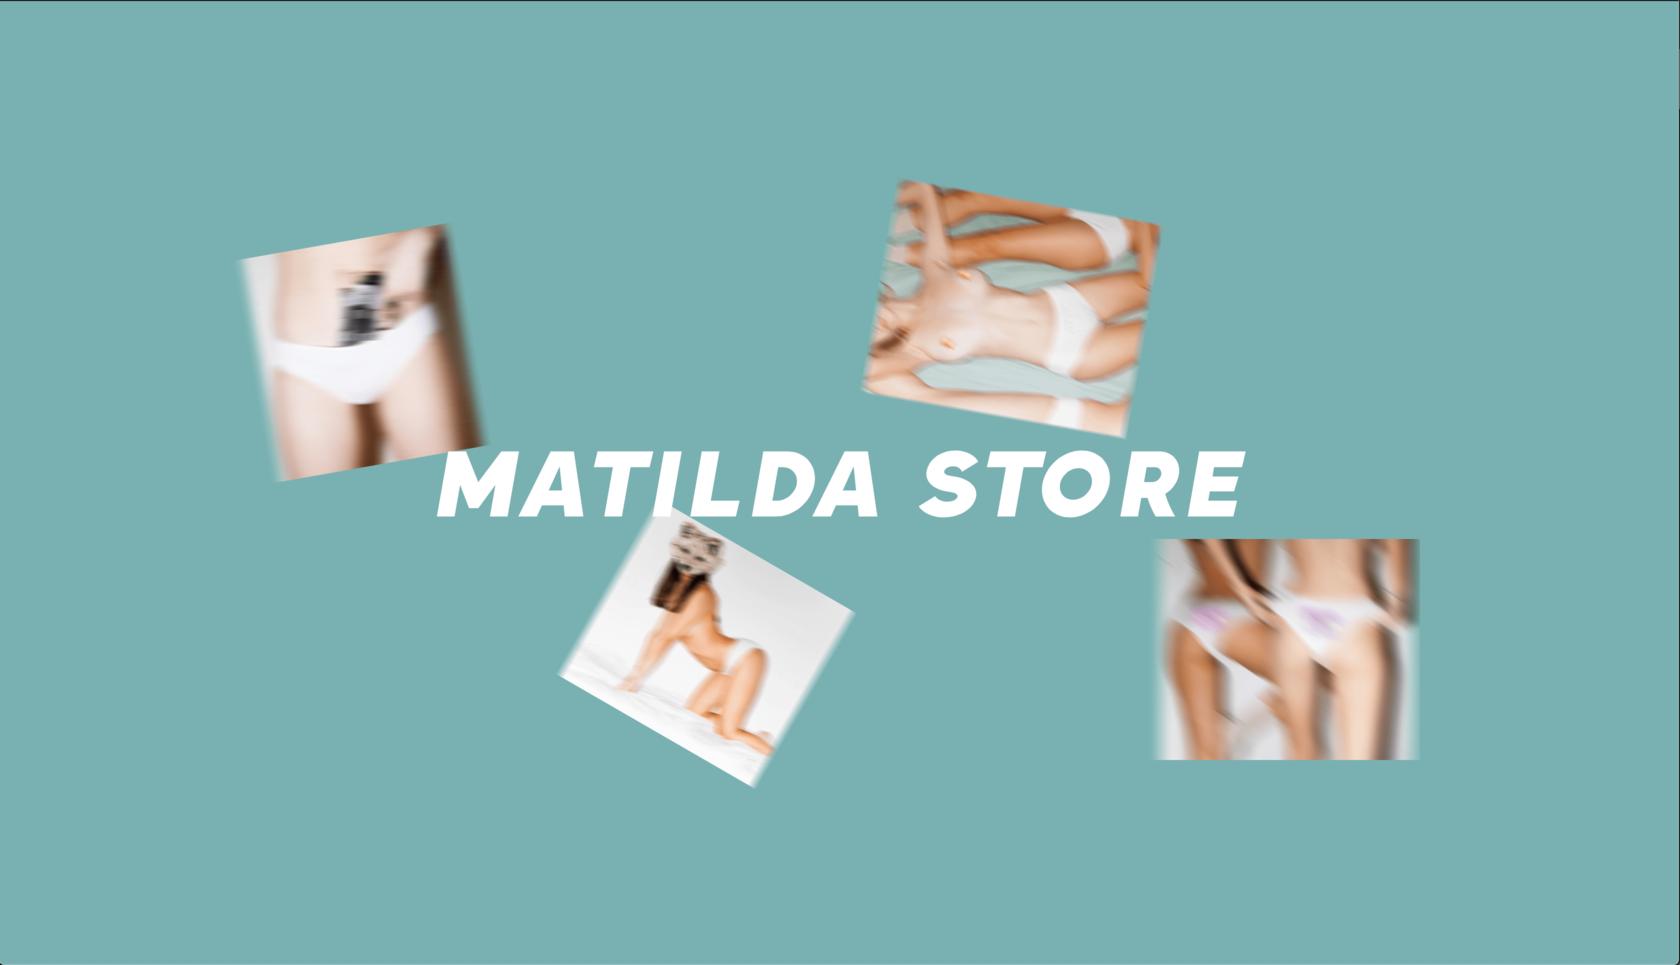 matilda store, кейс сайтов, кейсы тильда. матильда сторе сайт. matildastore, matilda store, allogalochka, allo galochka